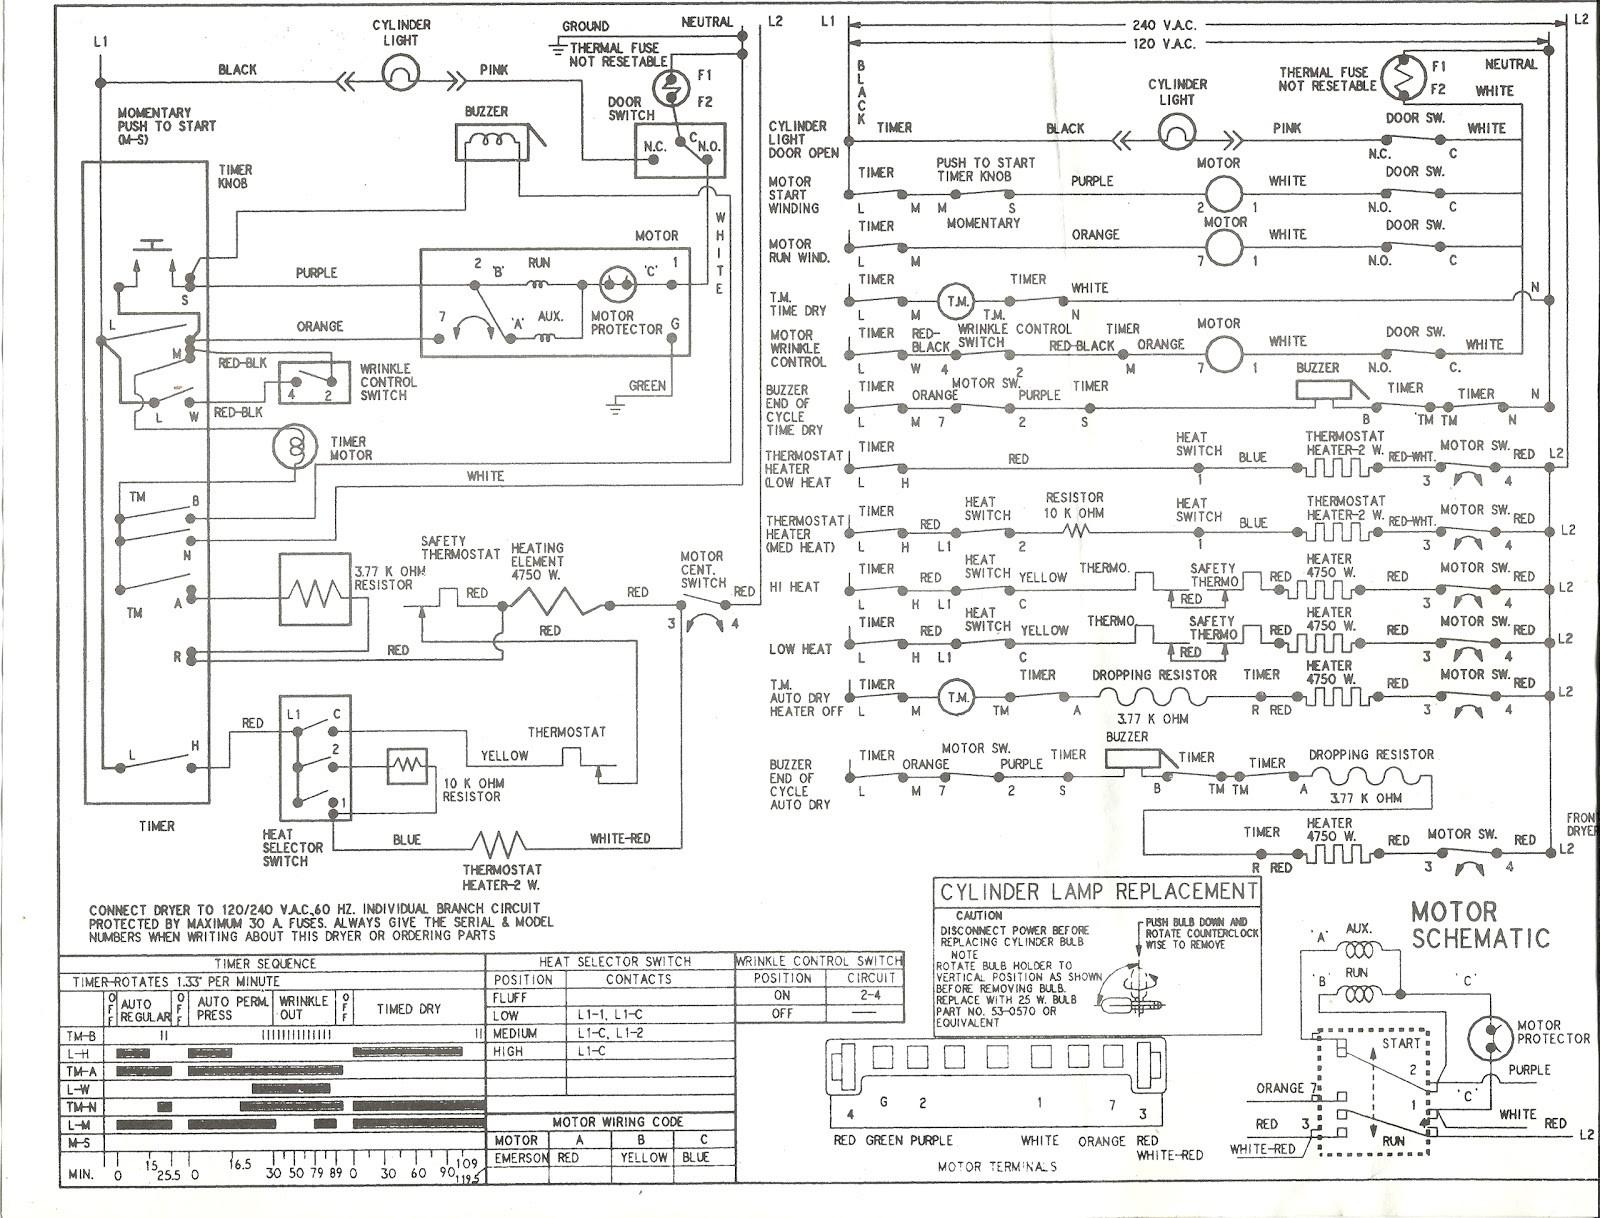 Kenmore Series Electric Dryer Wiring Diagram Schematic